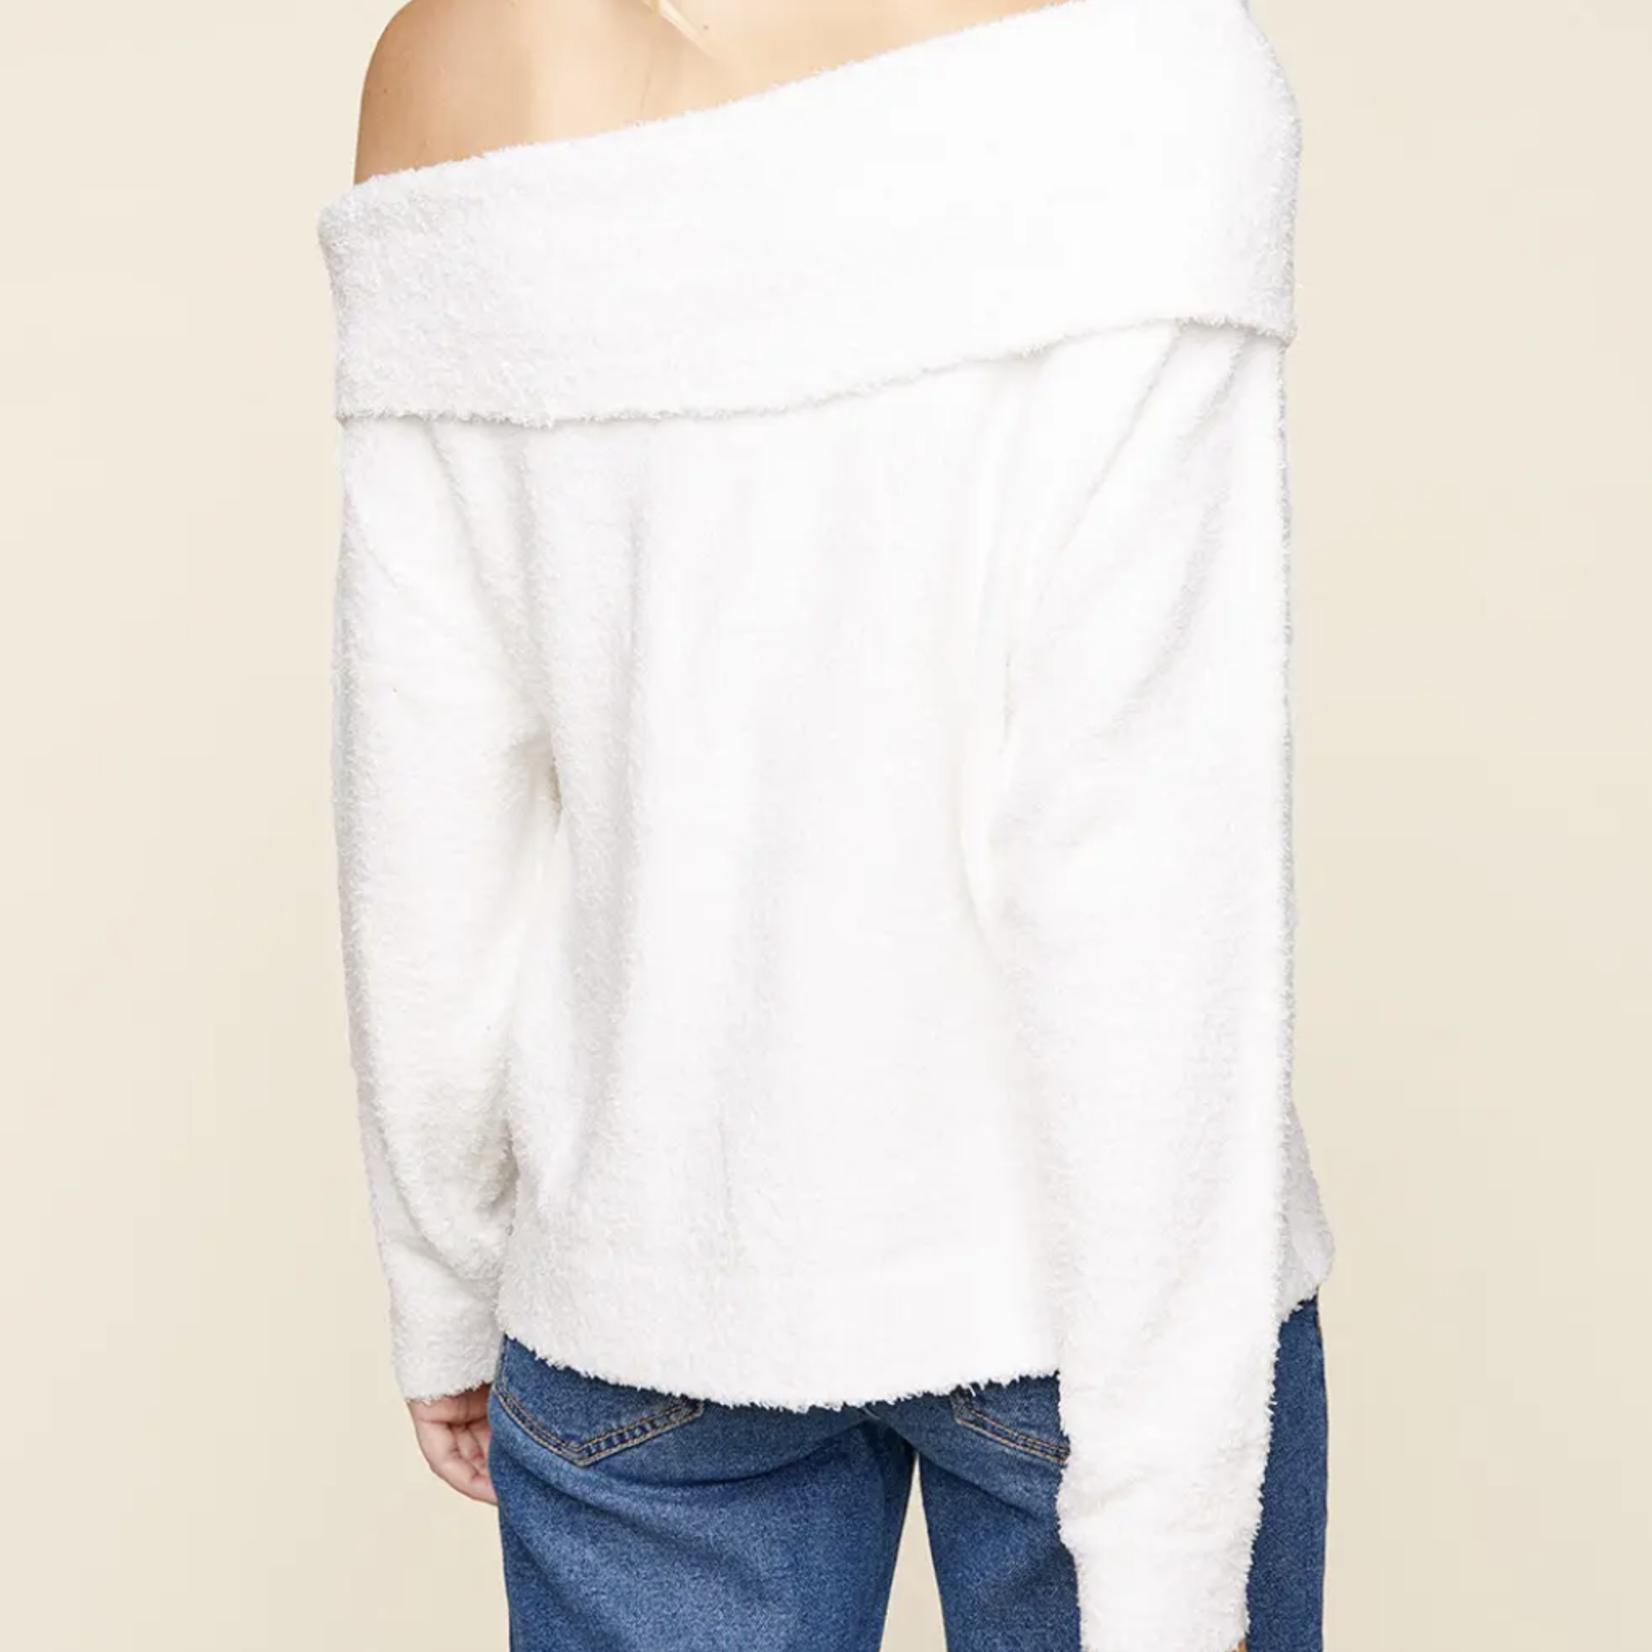 Indigo Faire Ramona One Shoulder Sweater